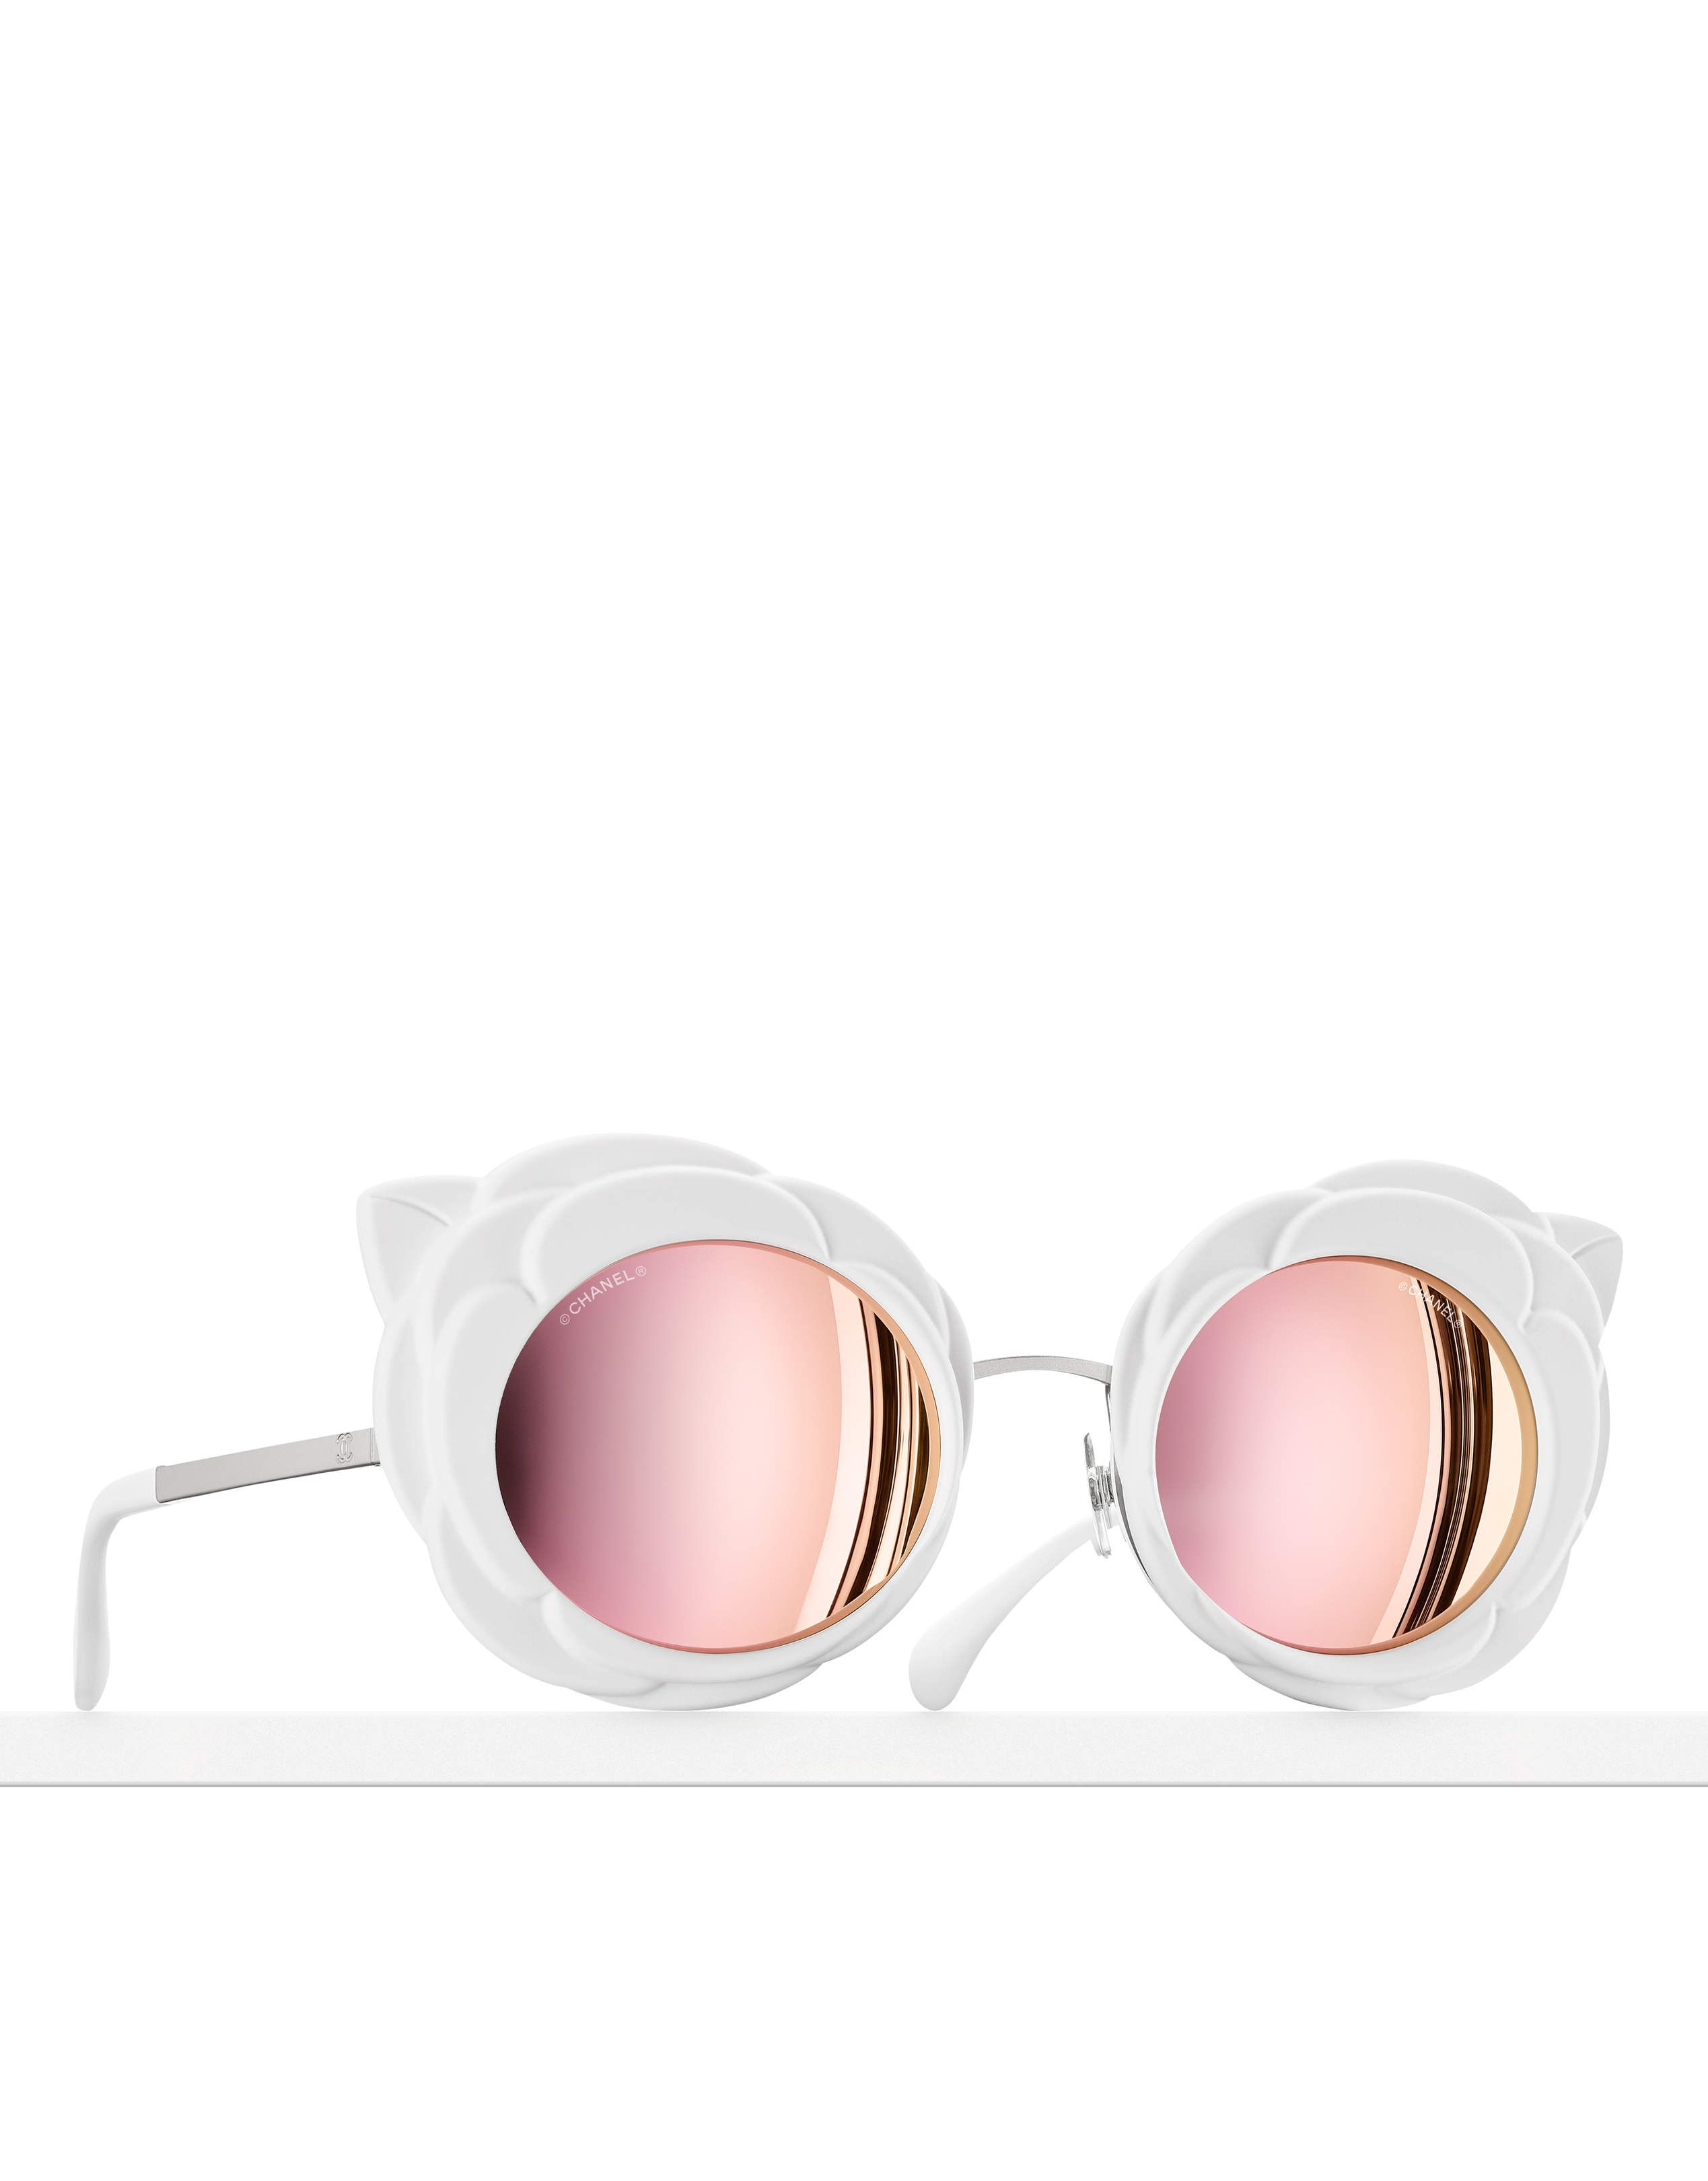 14cc2c50bbf5a3 Collection lunettes 2017 - reprogram